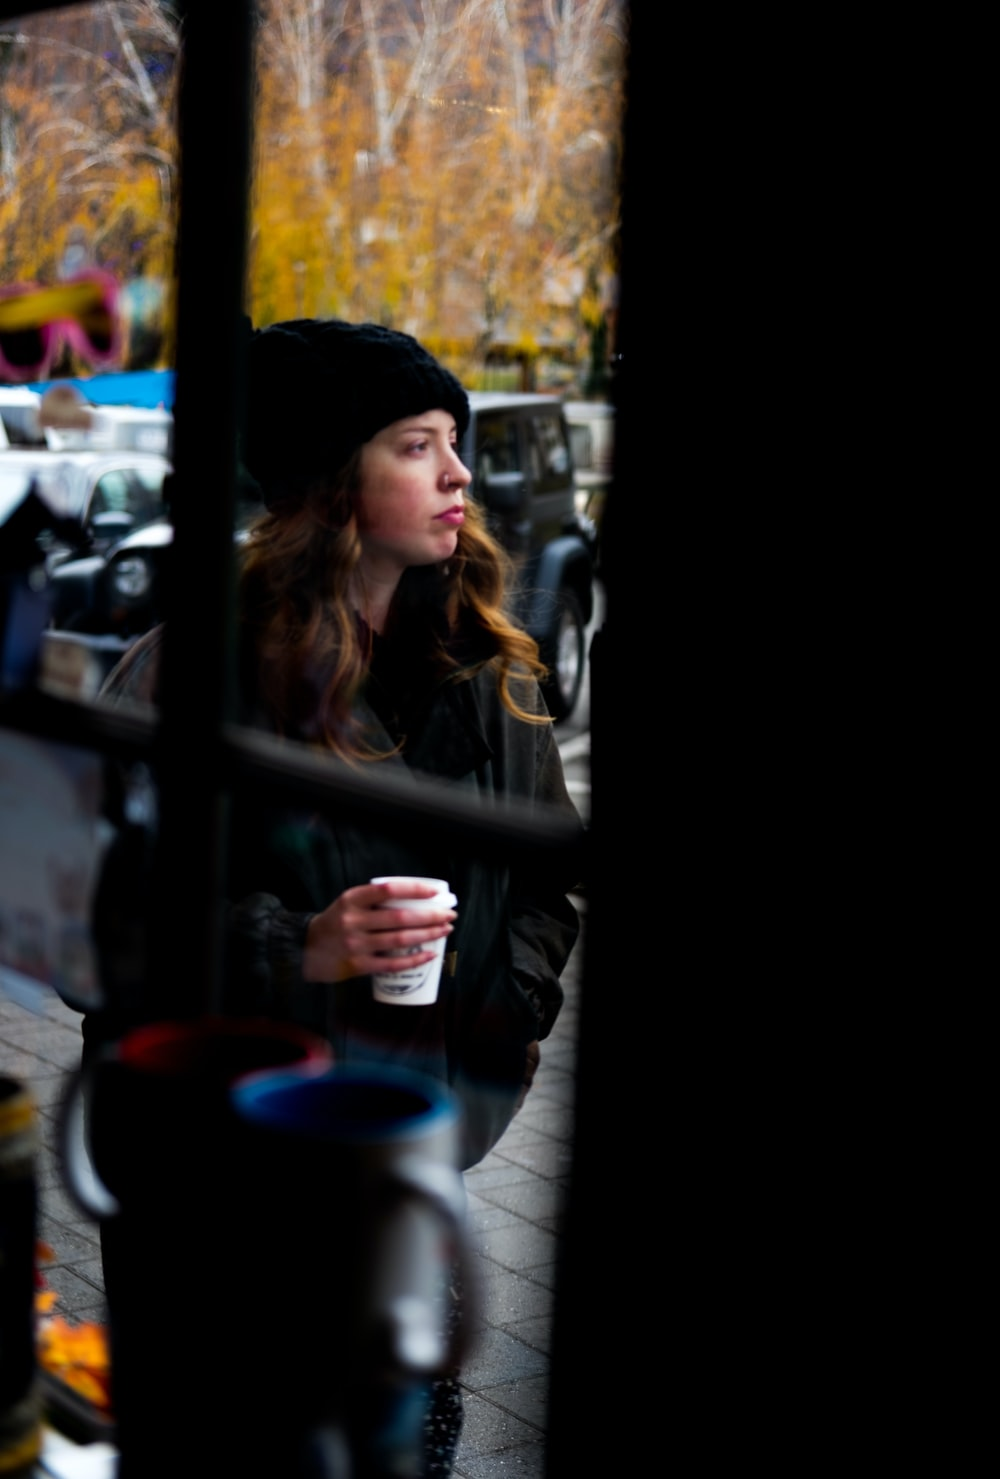 woman in black knit cap holding blue ceramic mug